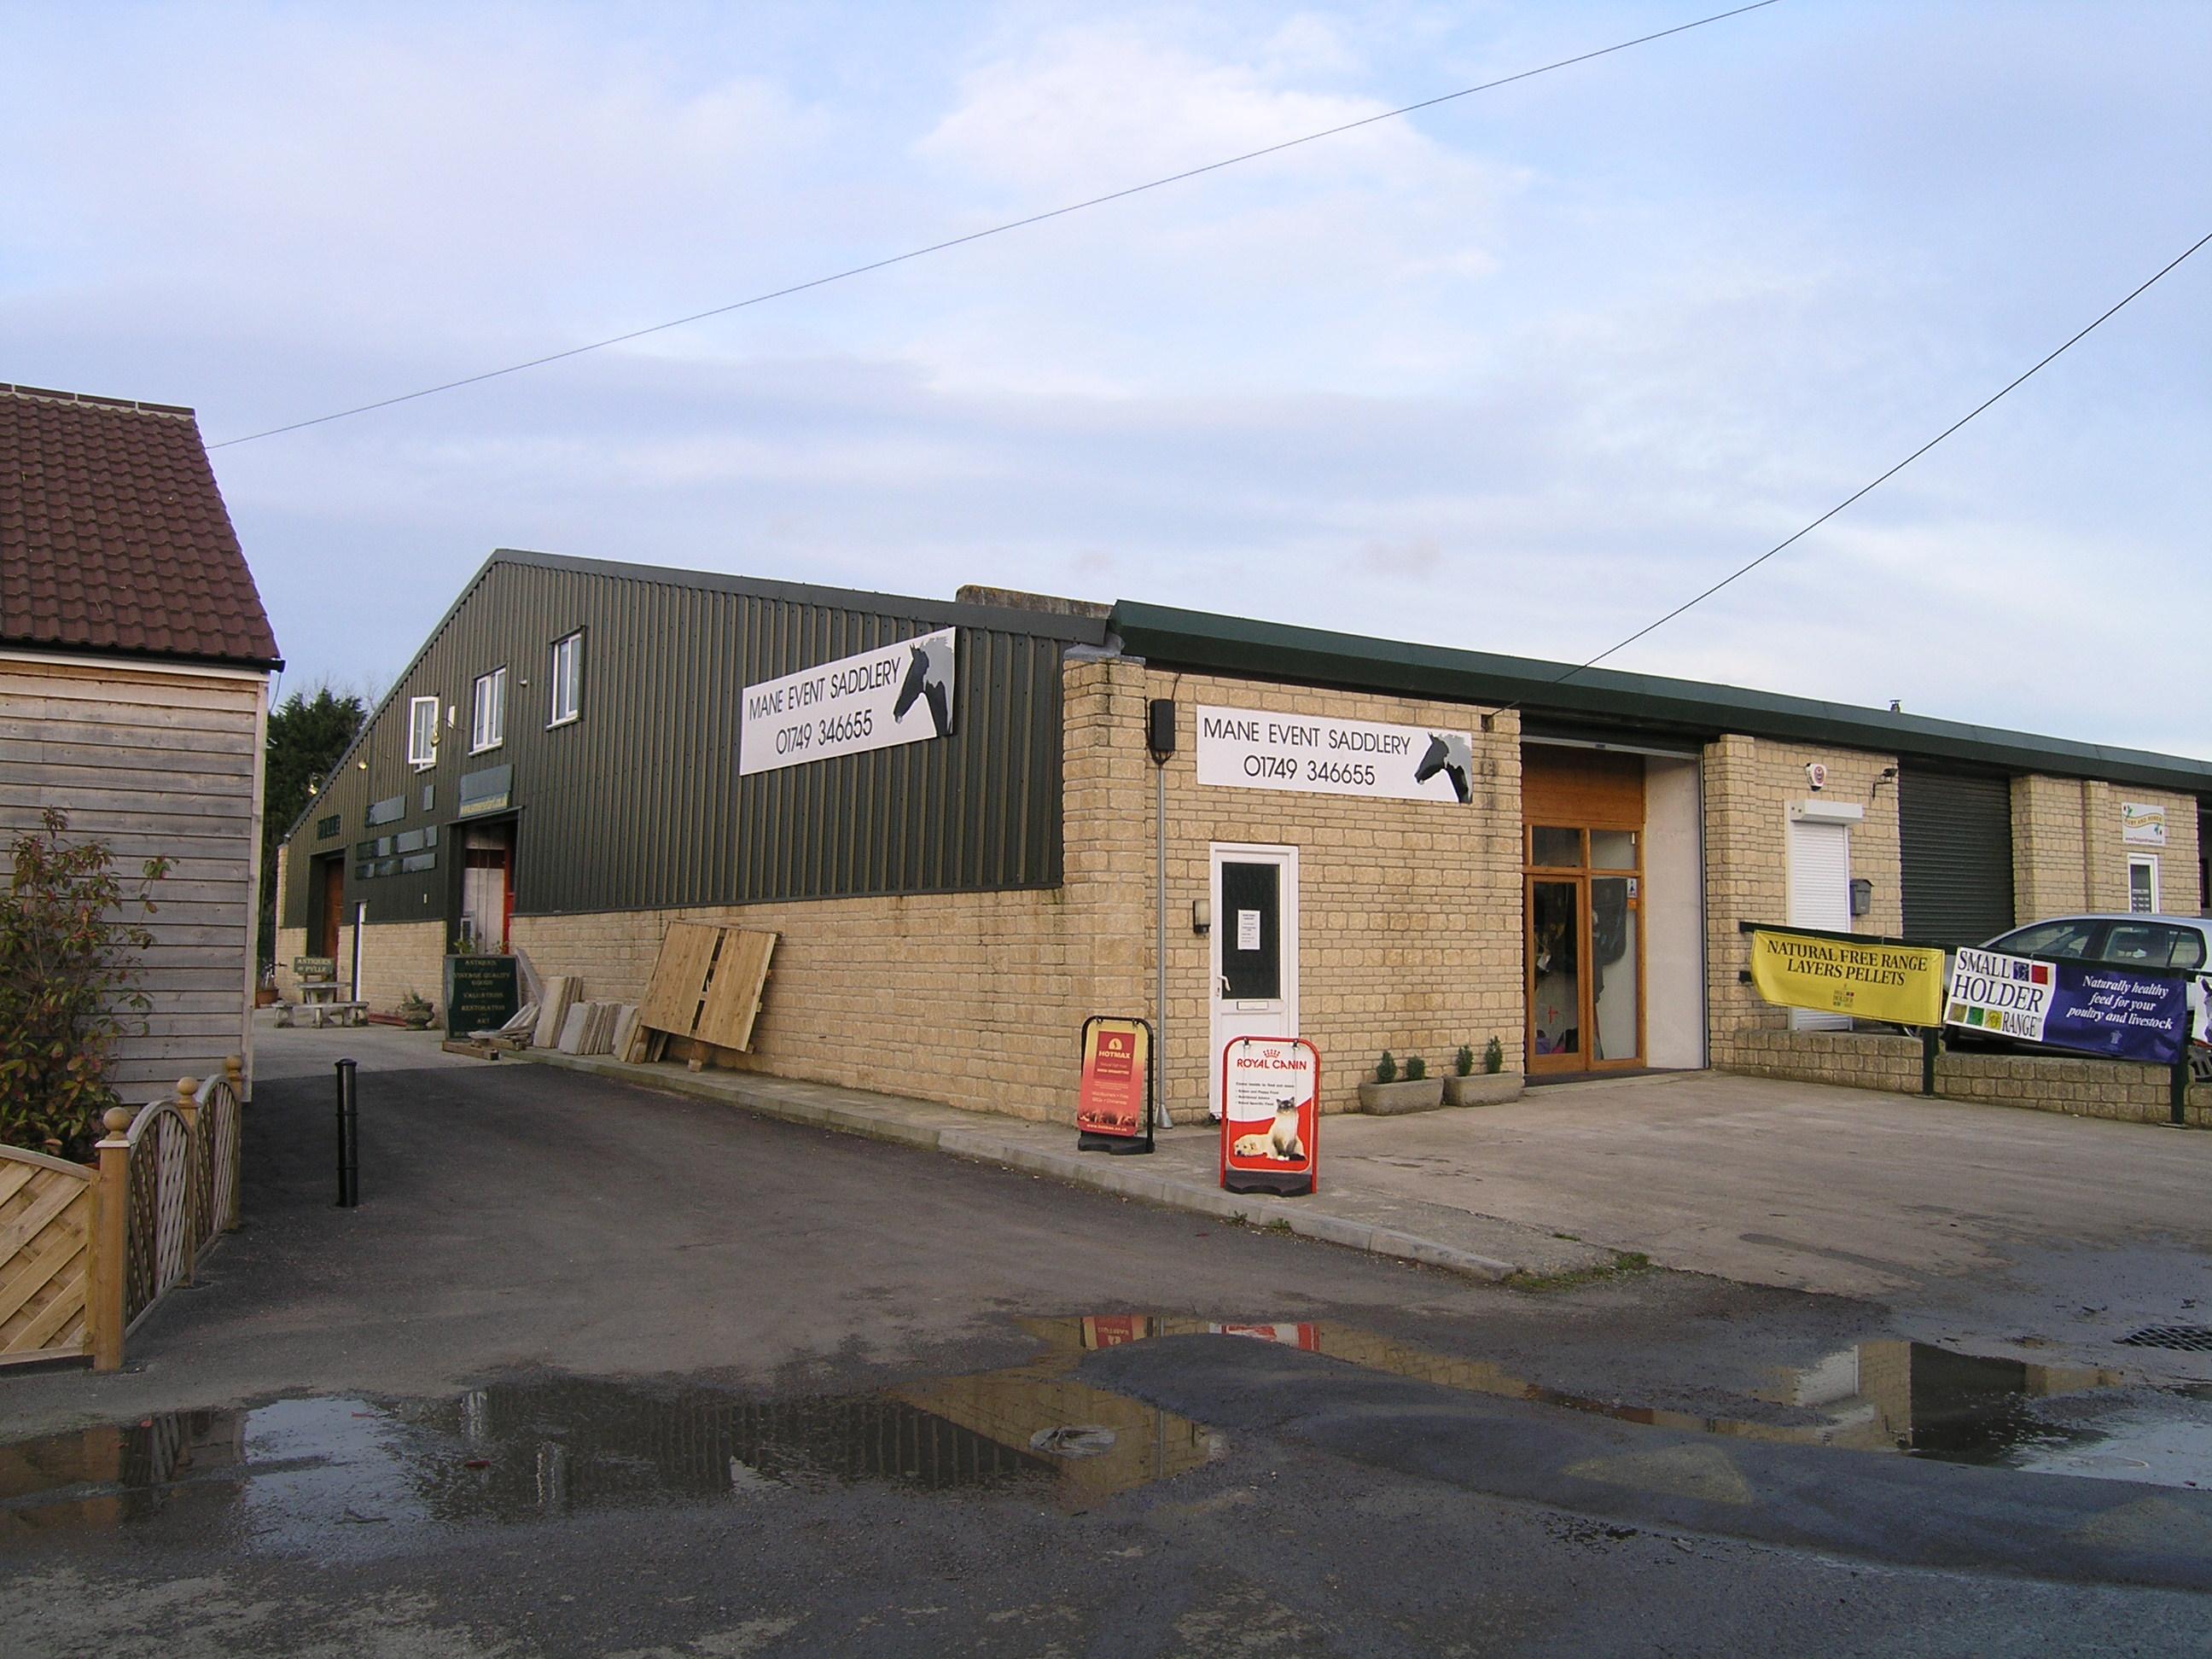 Mane Event Saddlery Limited, Pylle, Shepton Mallet